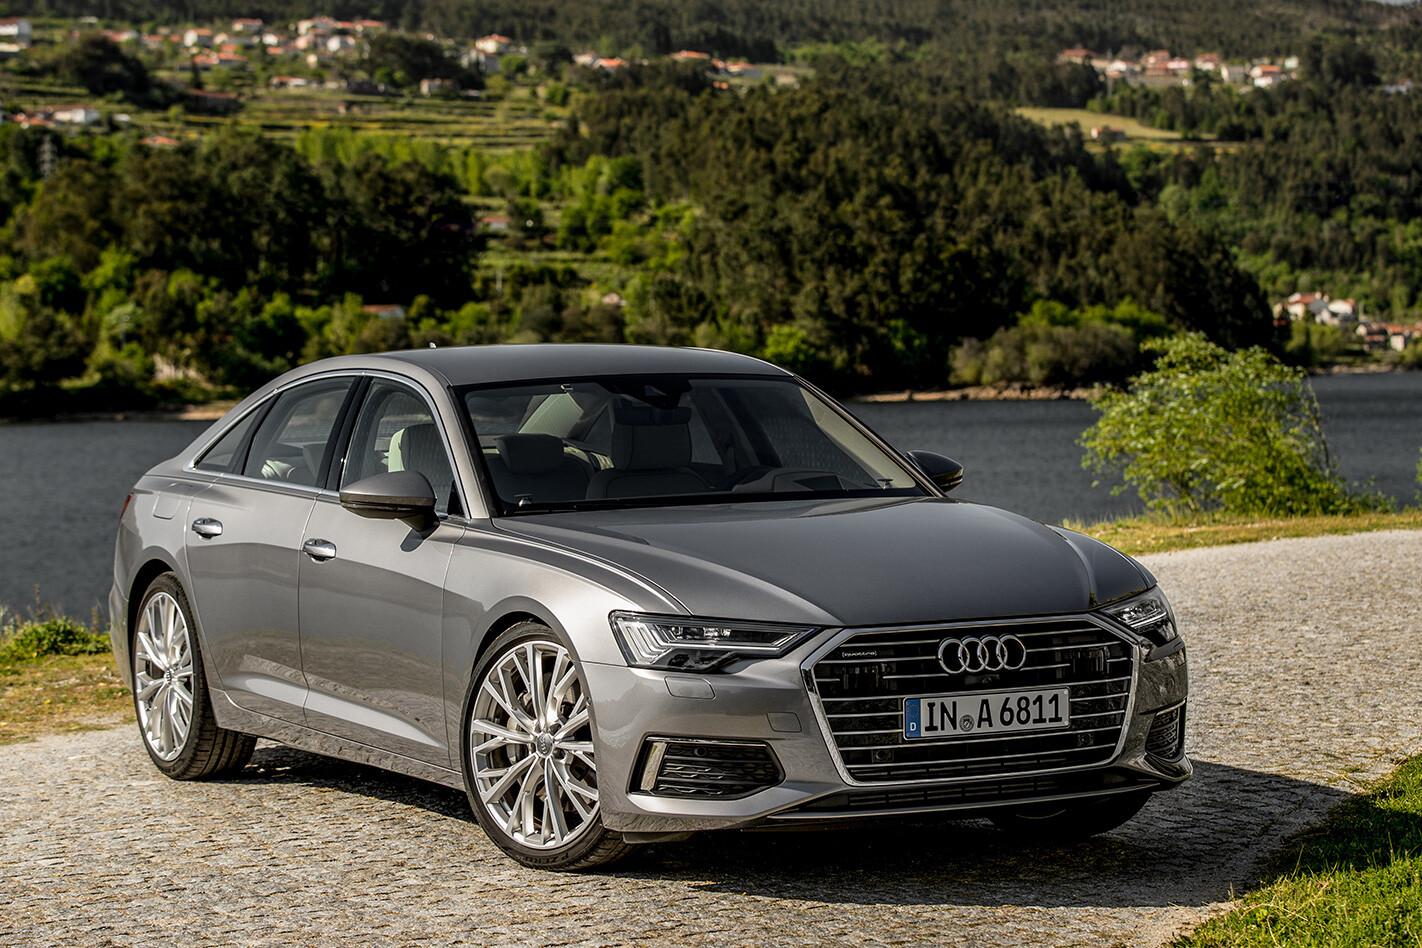 Audi A 6 Front Qtr Jpg